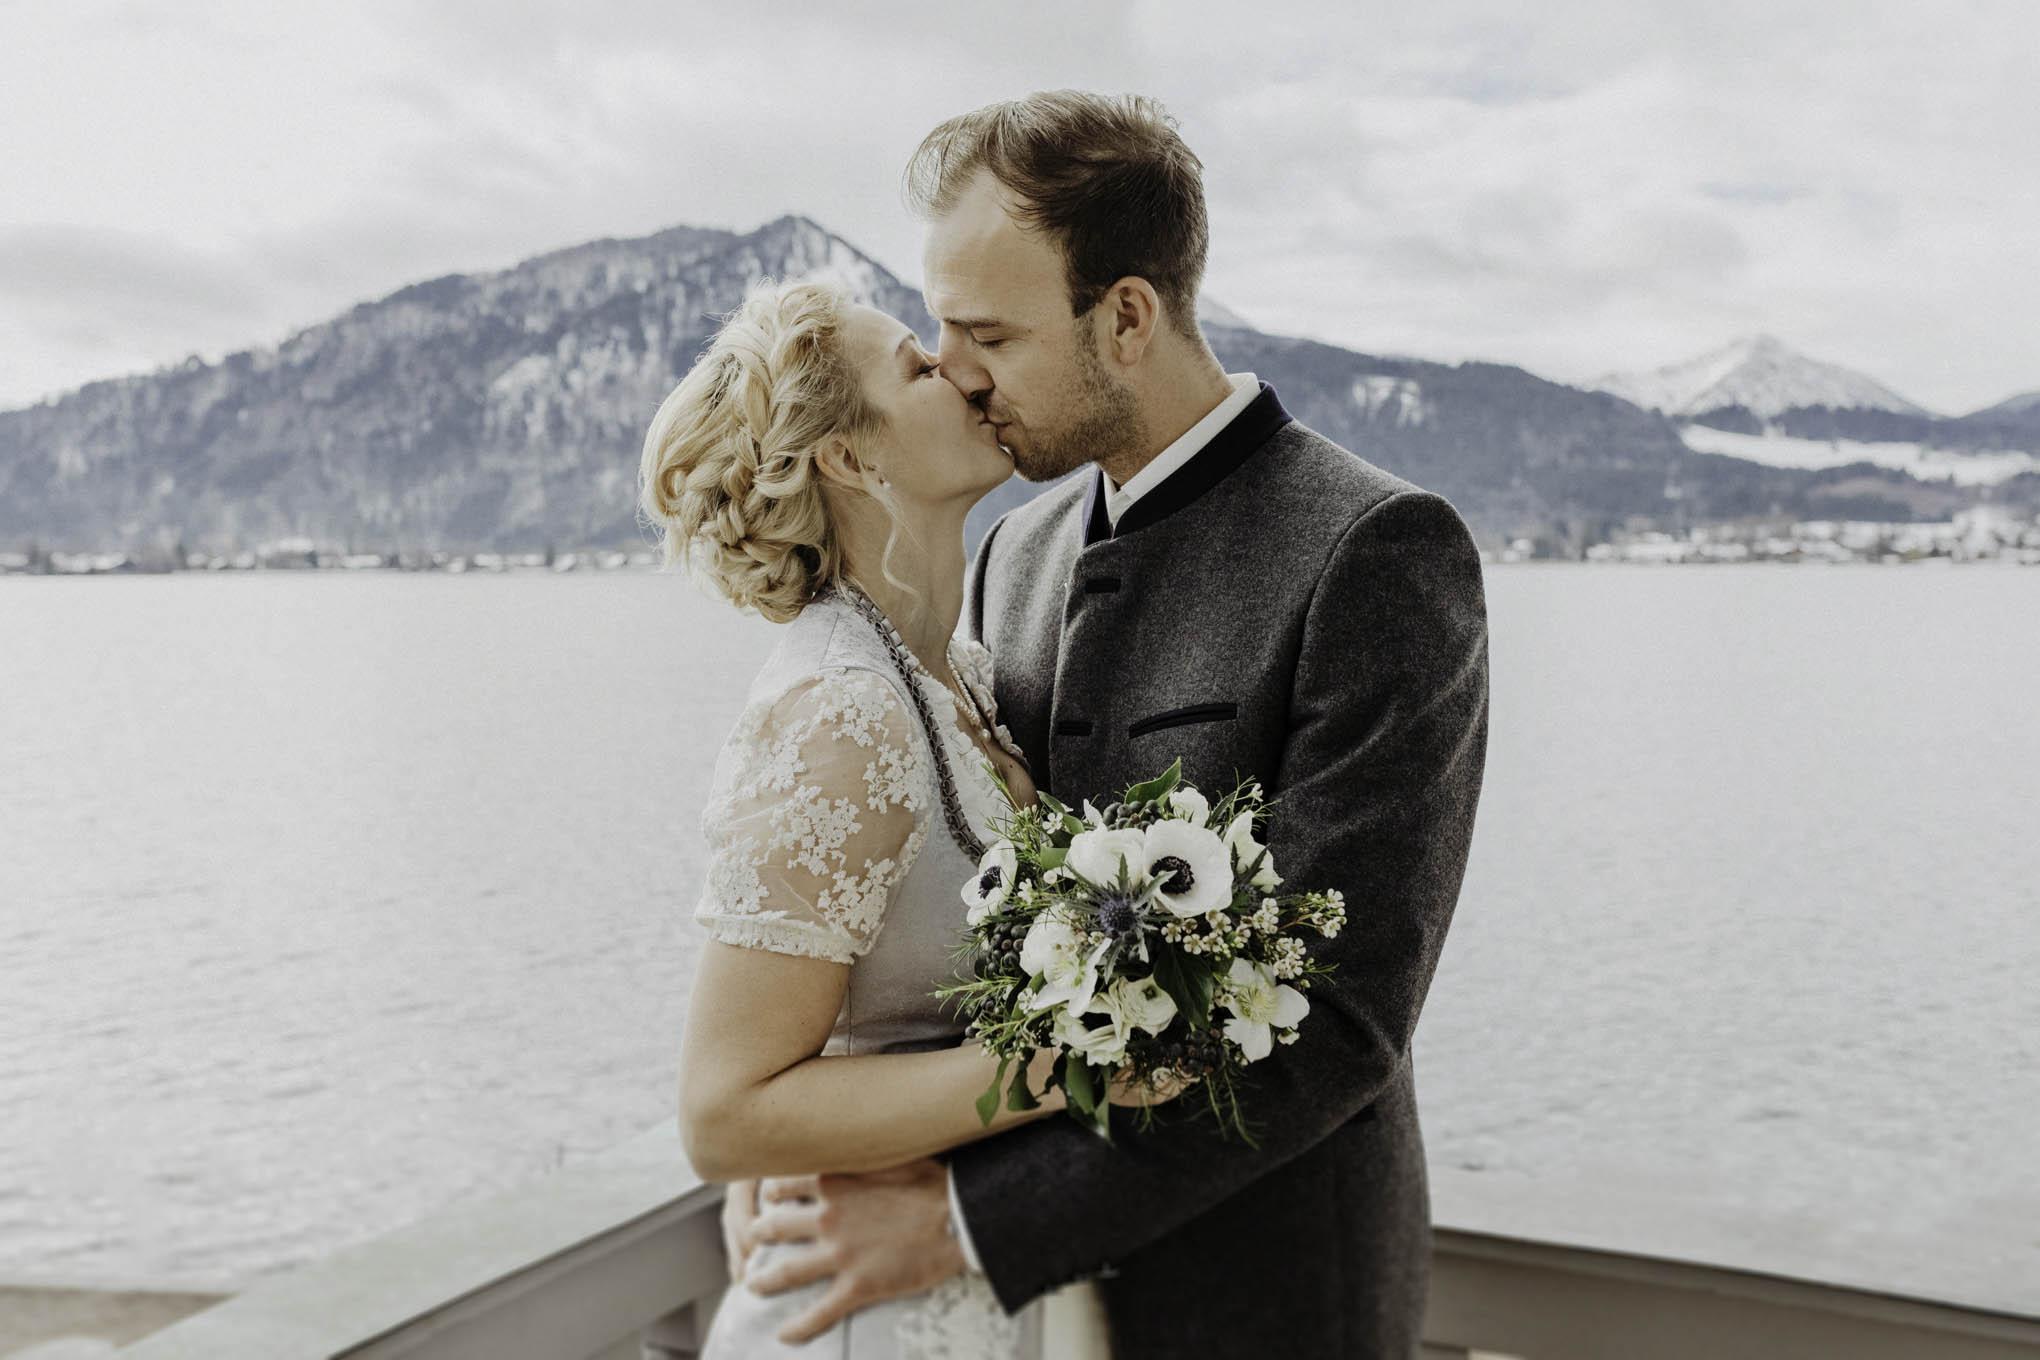 Brautpaar in Tracht am Tegernsee